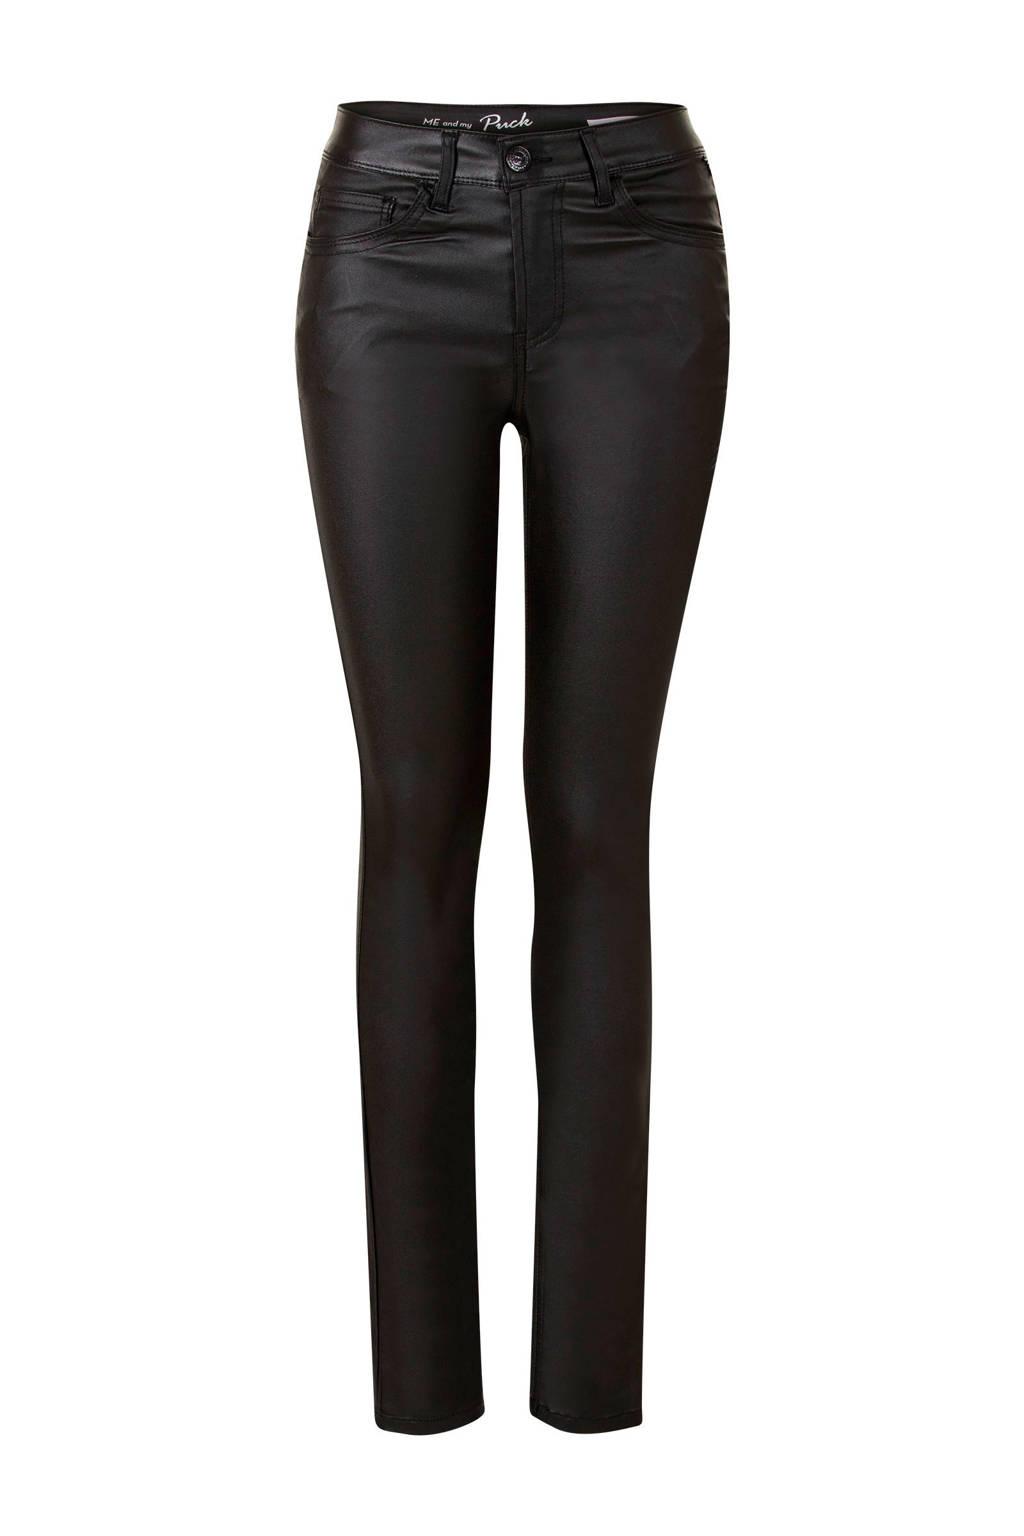 Miss Etam Regulier gecoate slim fit broek zwart, Zwart